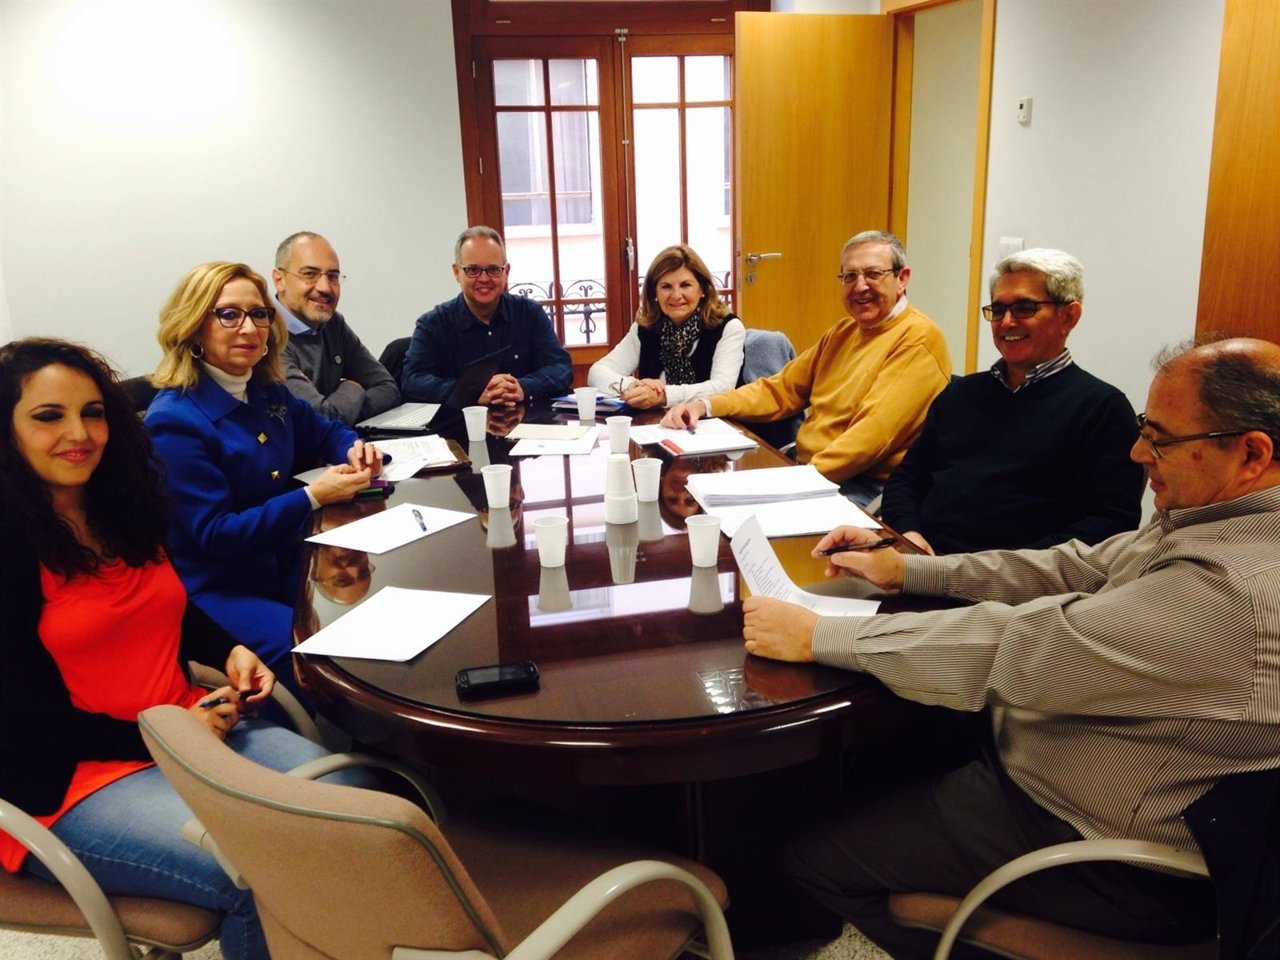 Comisión interdepartamental sobre enfermedades raras